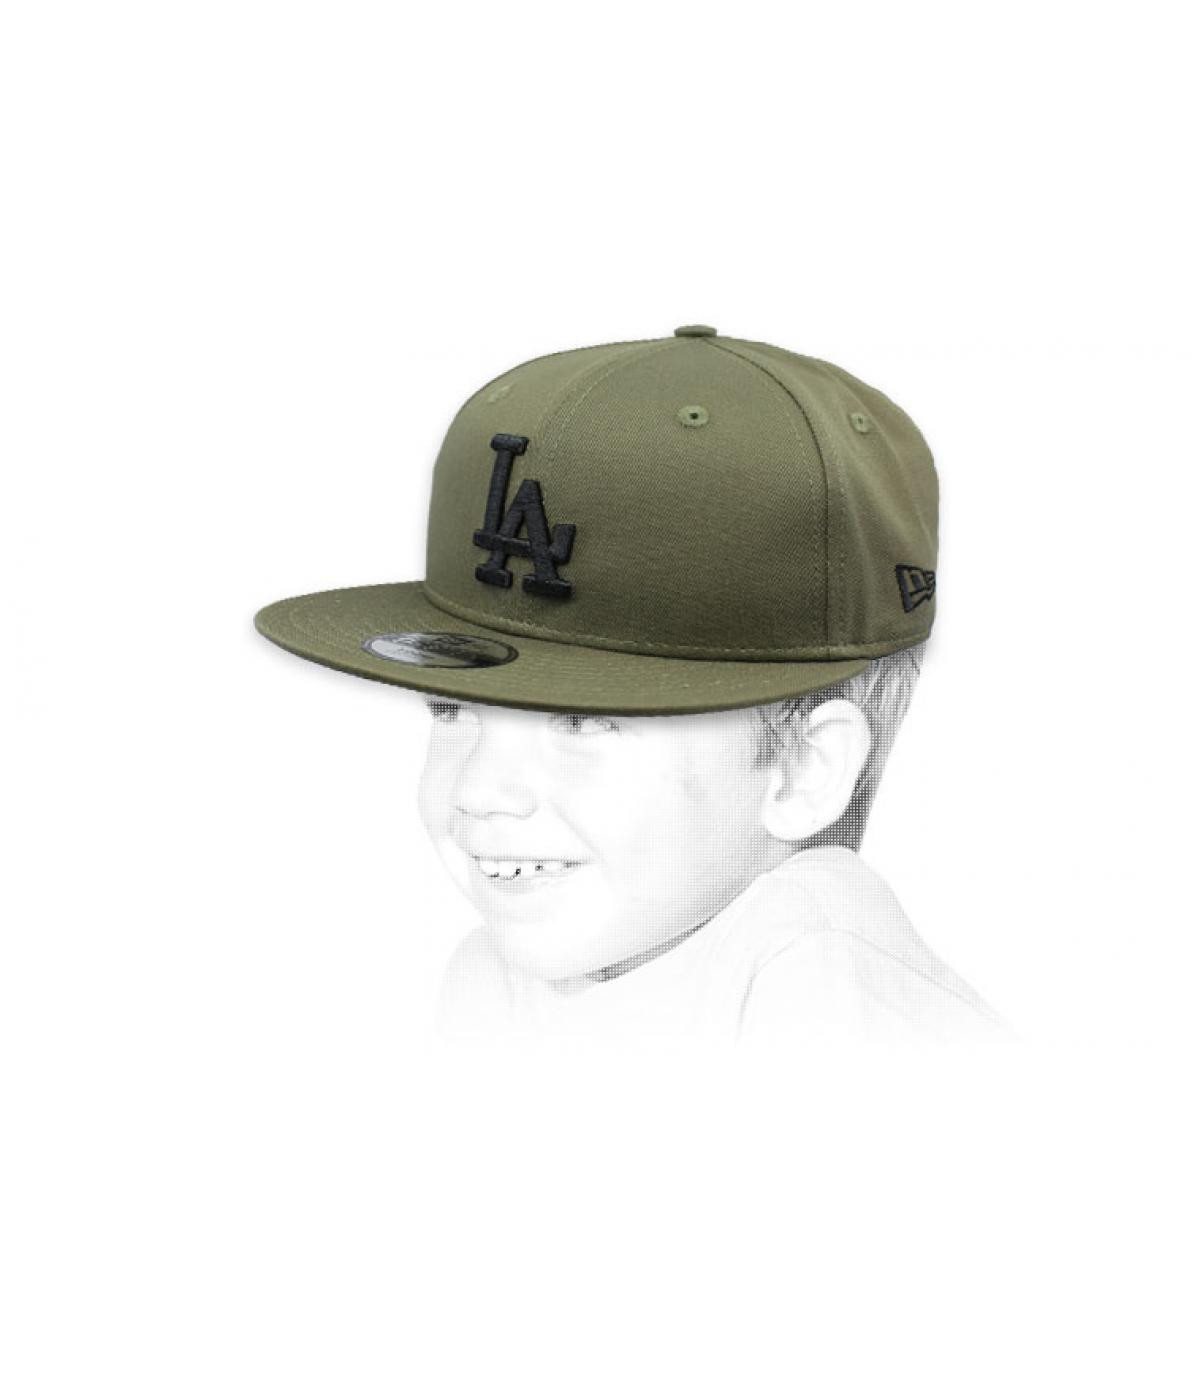 Kinder Cap LA grün schwarz